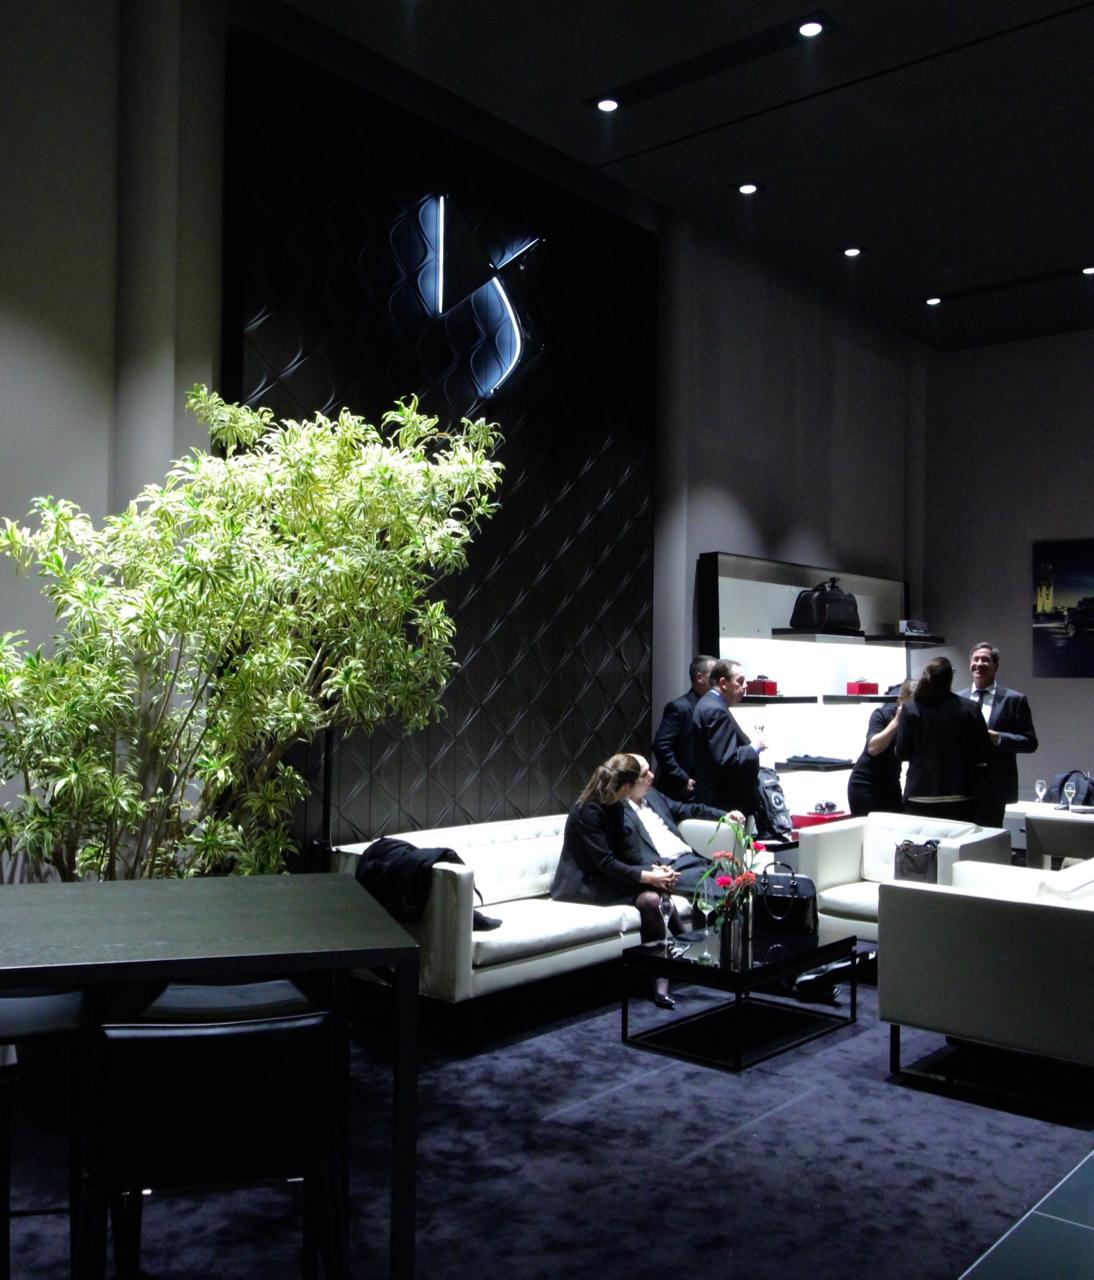 DS Store Hamburg Opening Cars Automobile DSAutomobiles Hamburg Eröffnung Showroom Autos ConceptCar Showcar Sportwagen Limousine ETense DSPerformance Eröffnungsfeier PepperAndGold DS3 DS5 DS4 Göttin